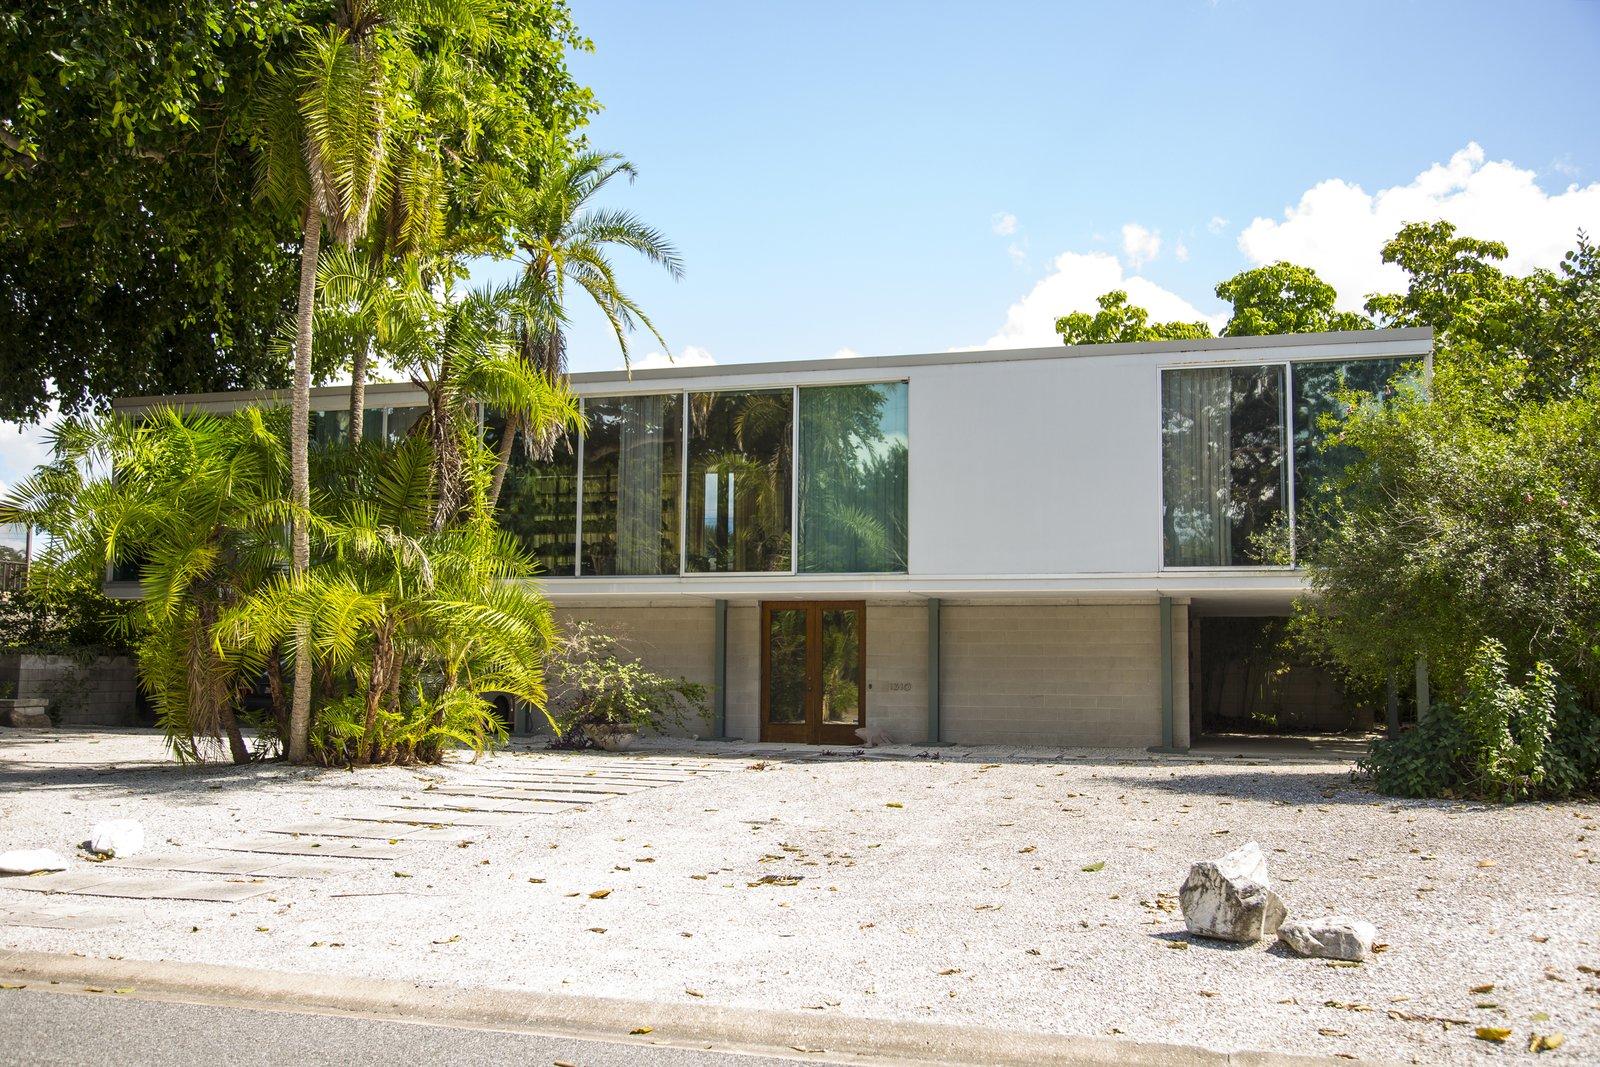 Outdoor, Front Yard, Walkways, Trees, Desert, and Shrubs Hiss Studio (1953), Architect Tim Seibert, FAIA  Hiss Studio